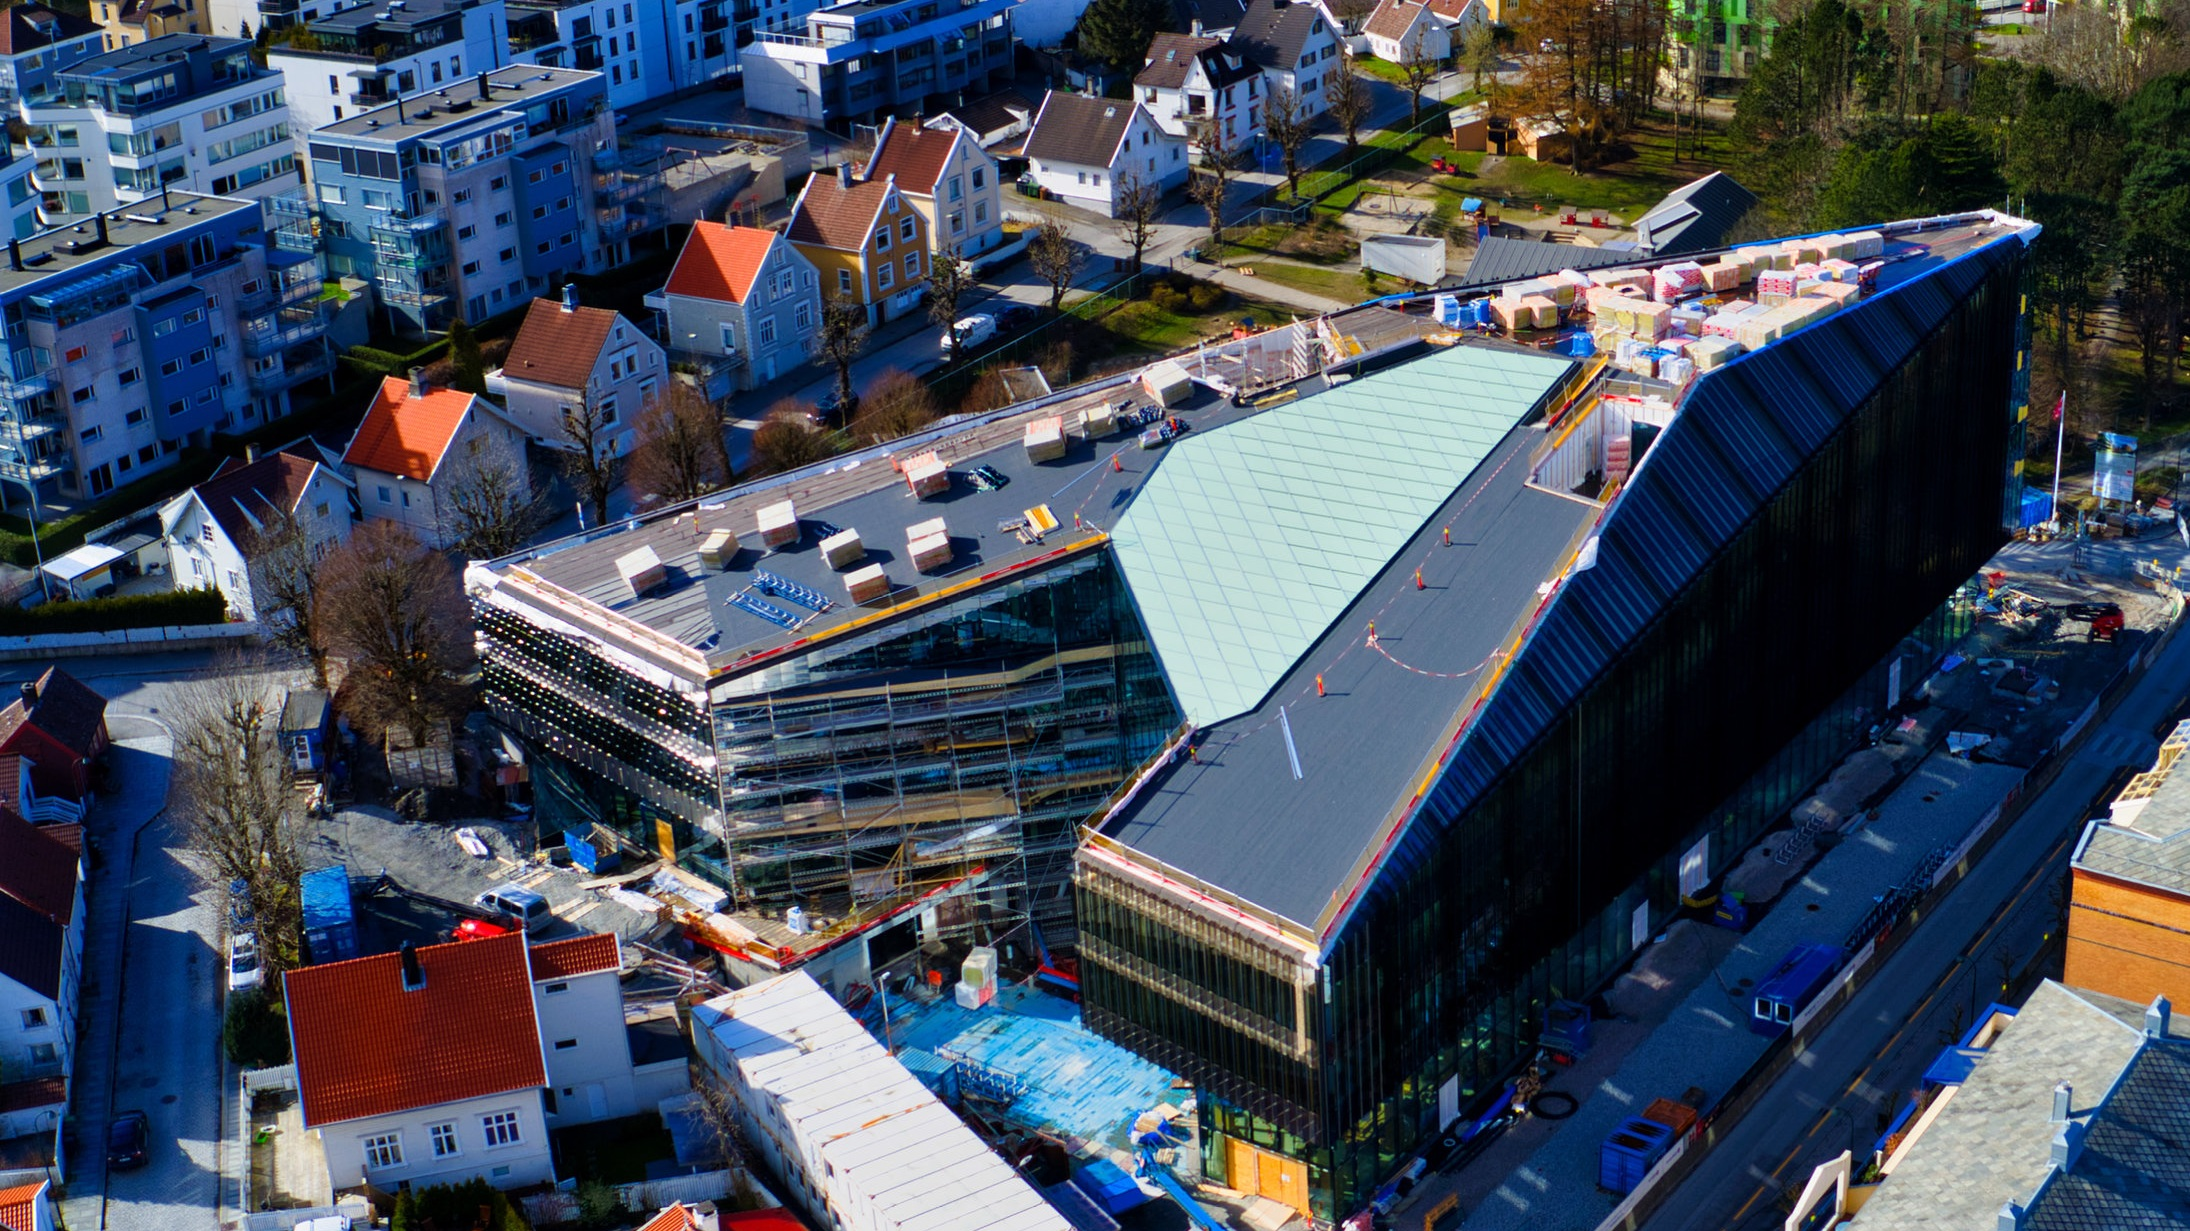 I DAG: SpareBank 1 SR-Bank flytter inn i Finansparken i Bjergsted i november. Bygget nærmer seg ferdigstillelse. Foto: 3D4D.no